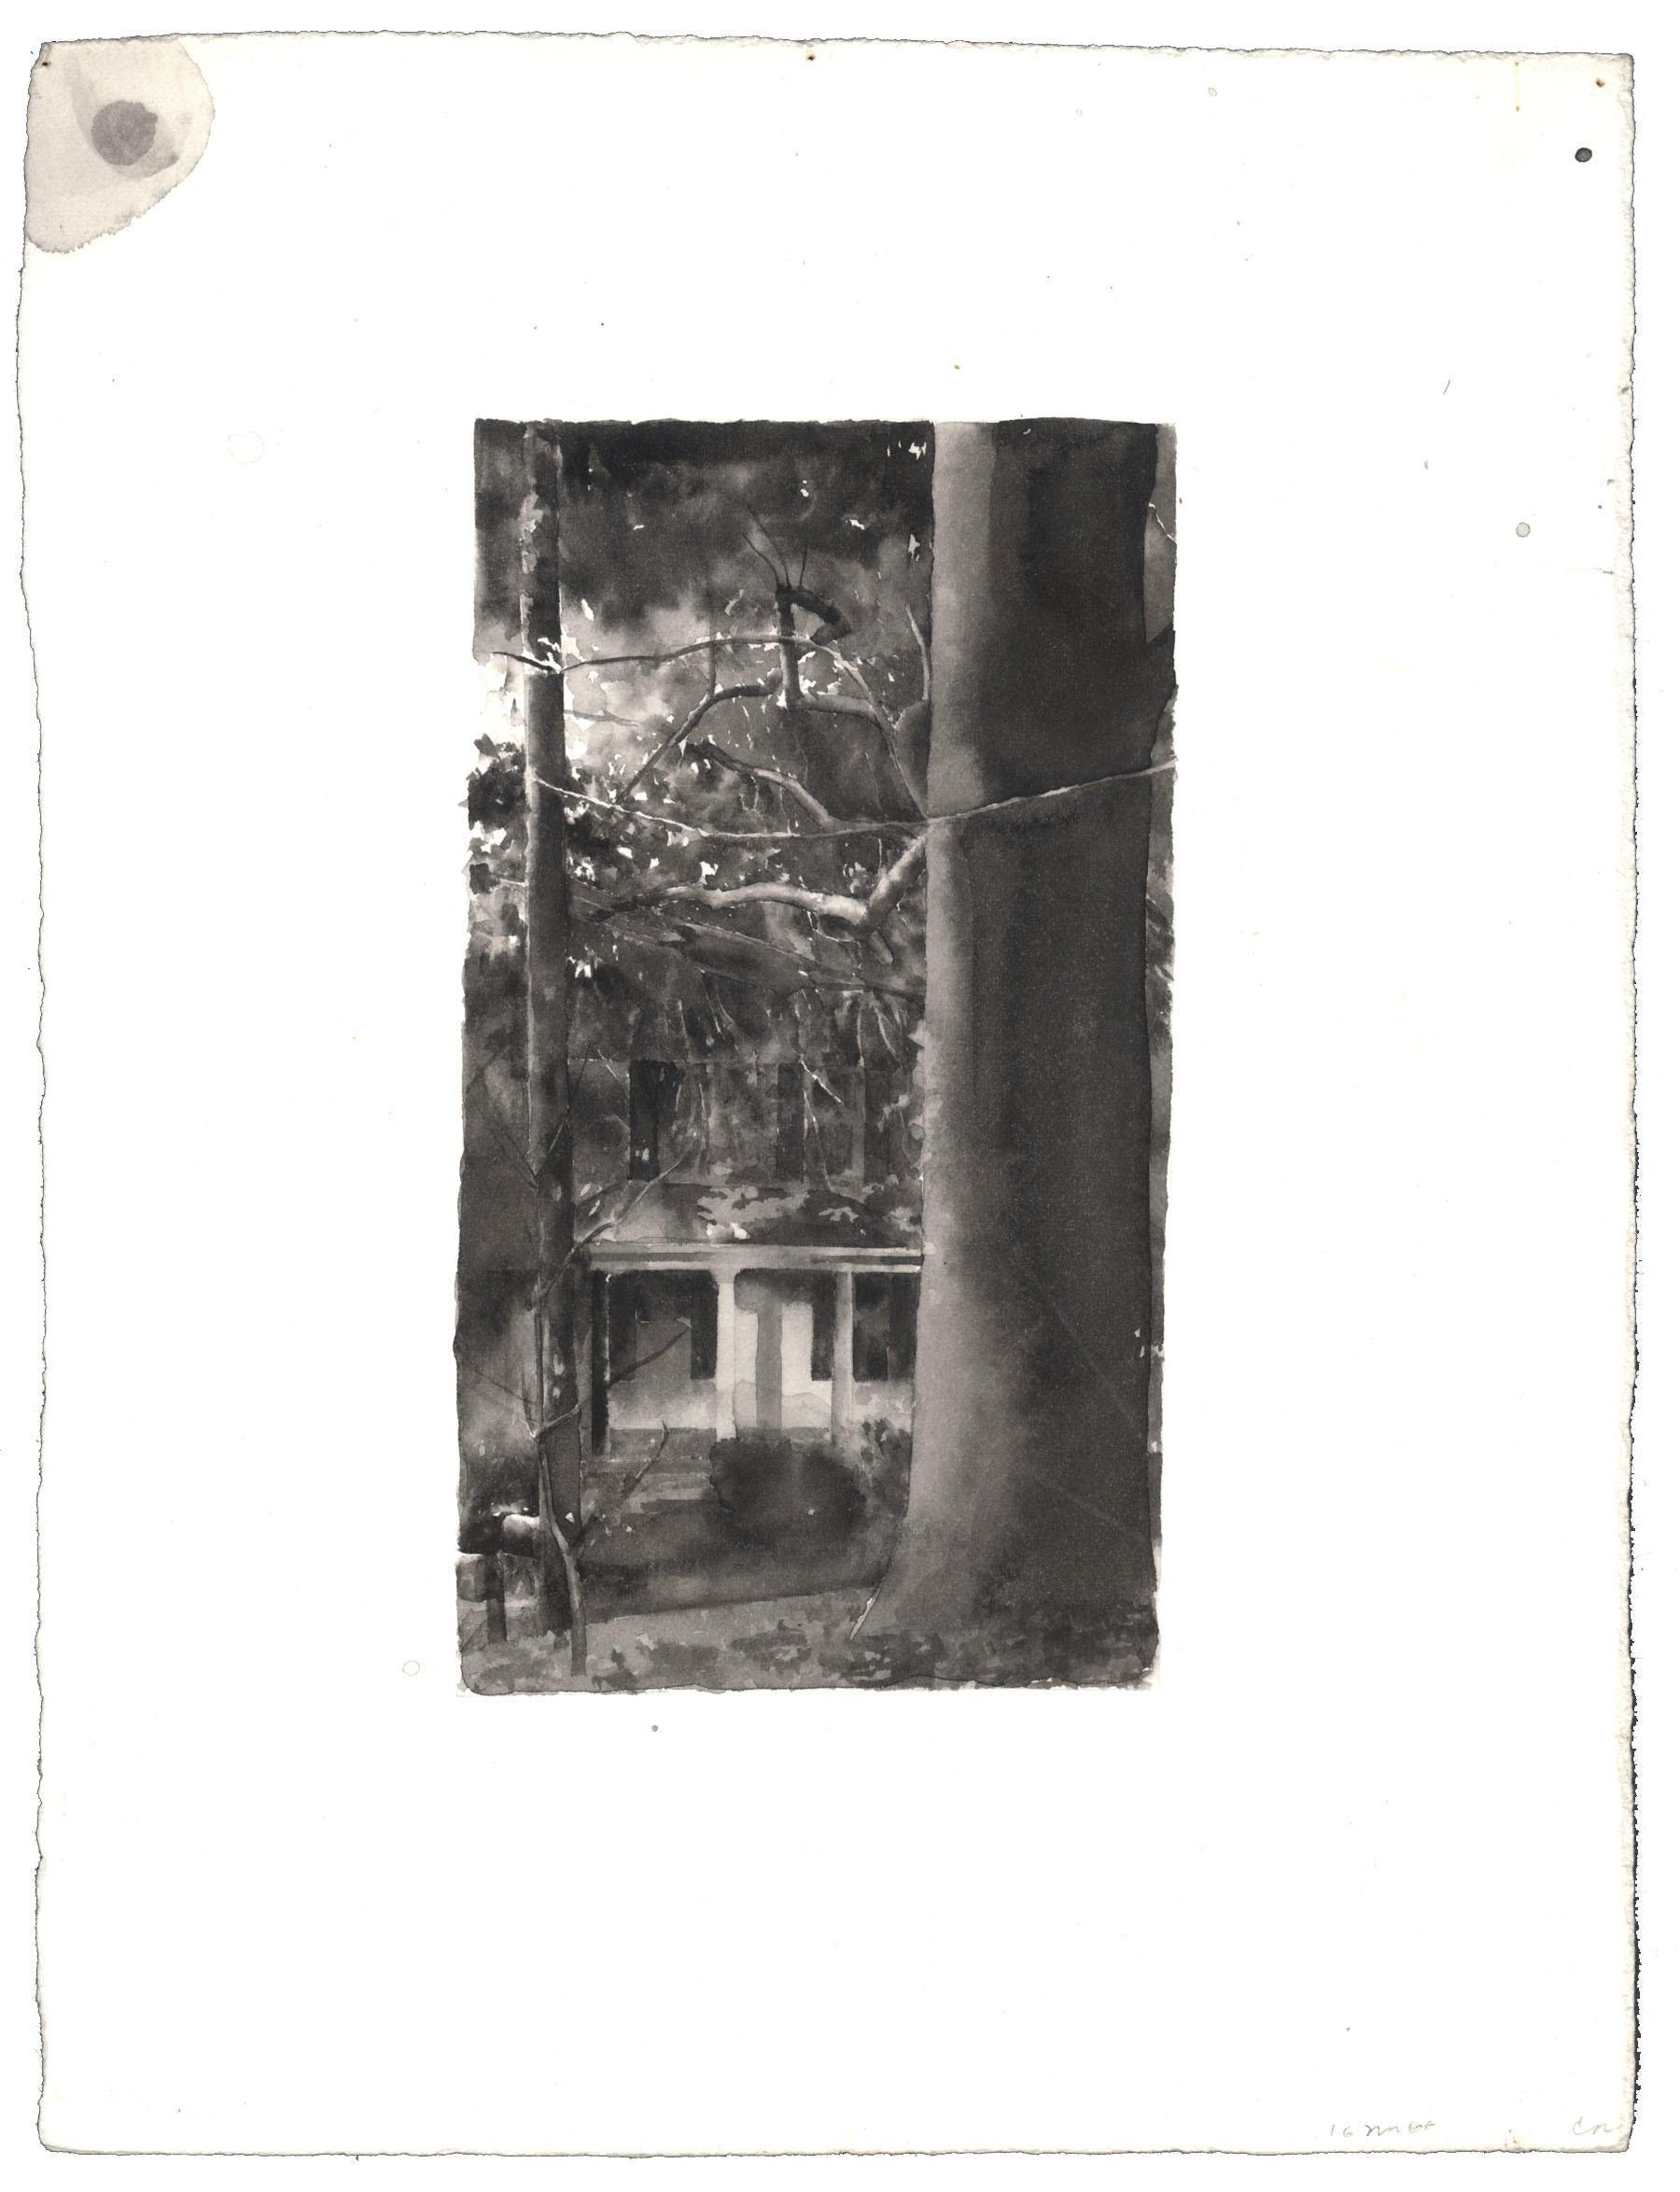 Streetlight image